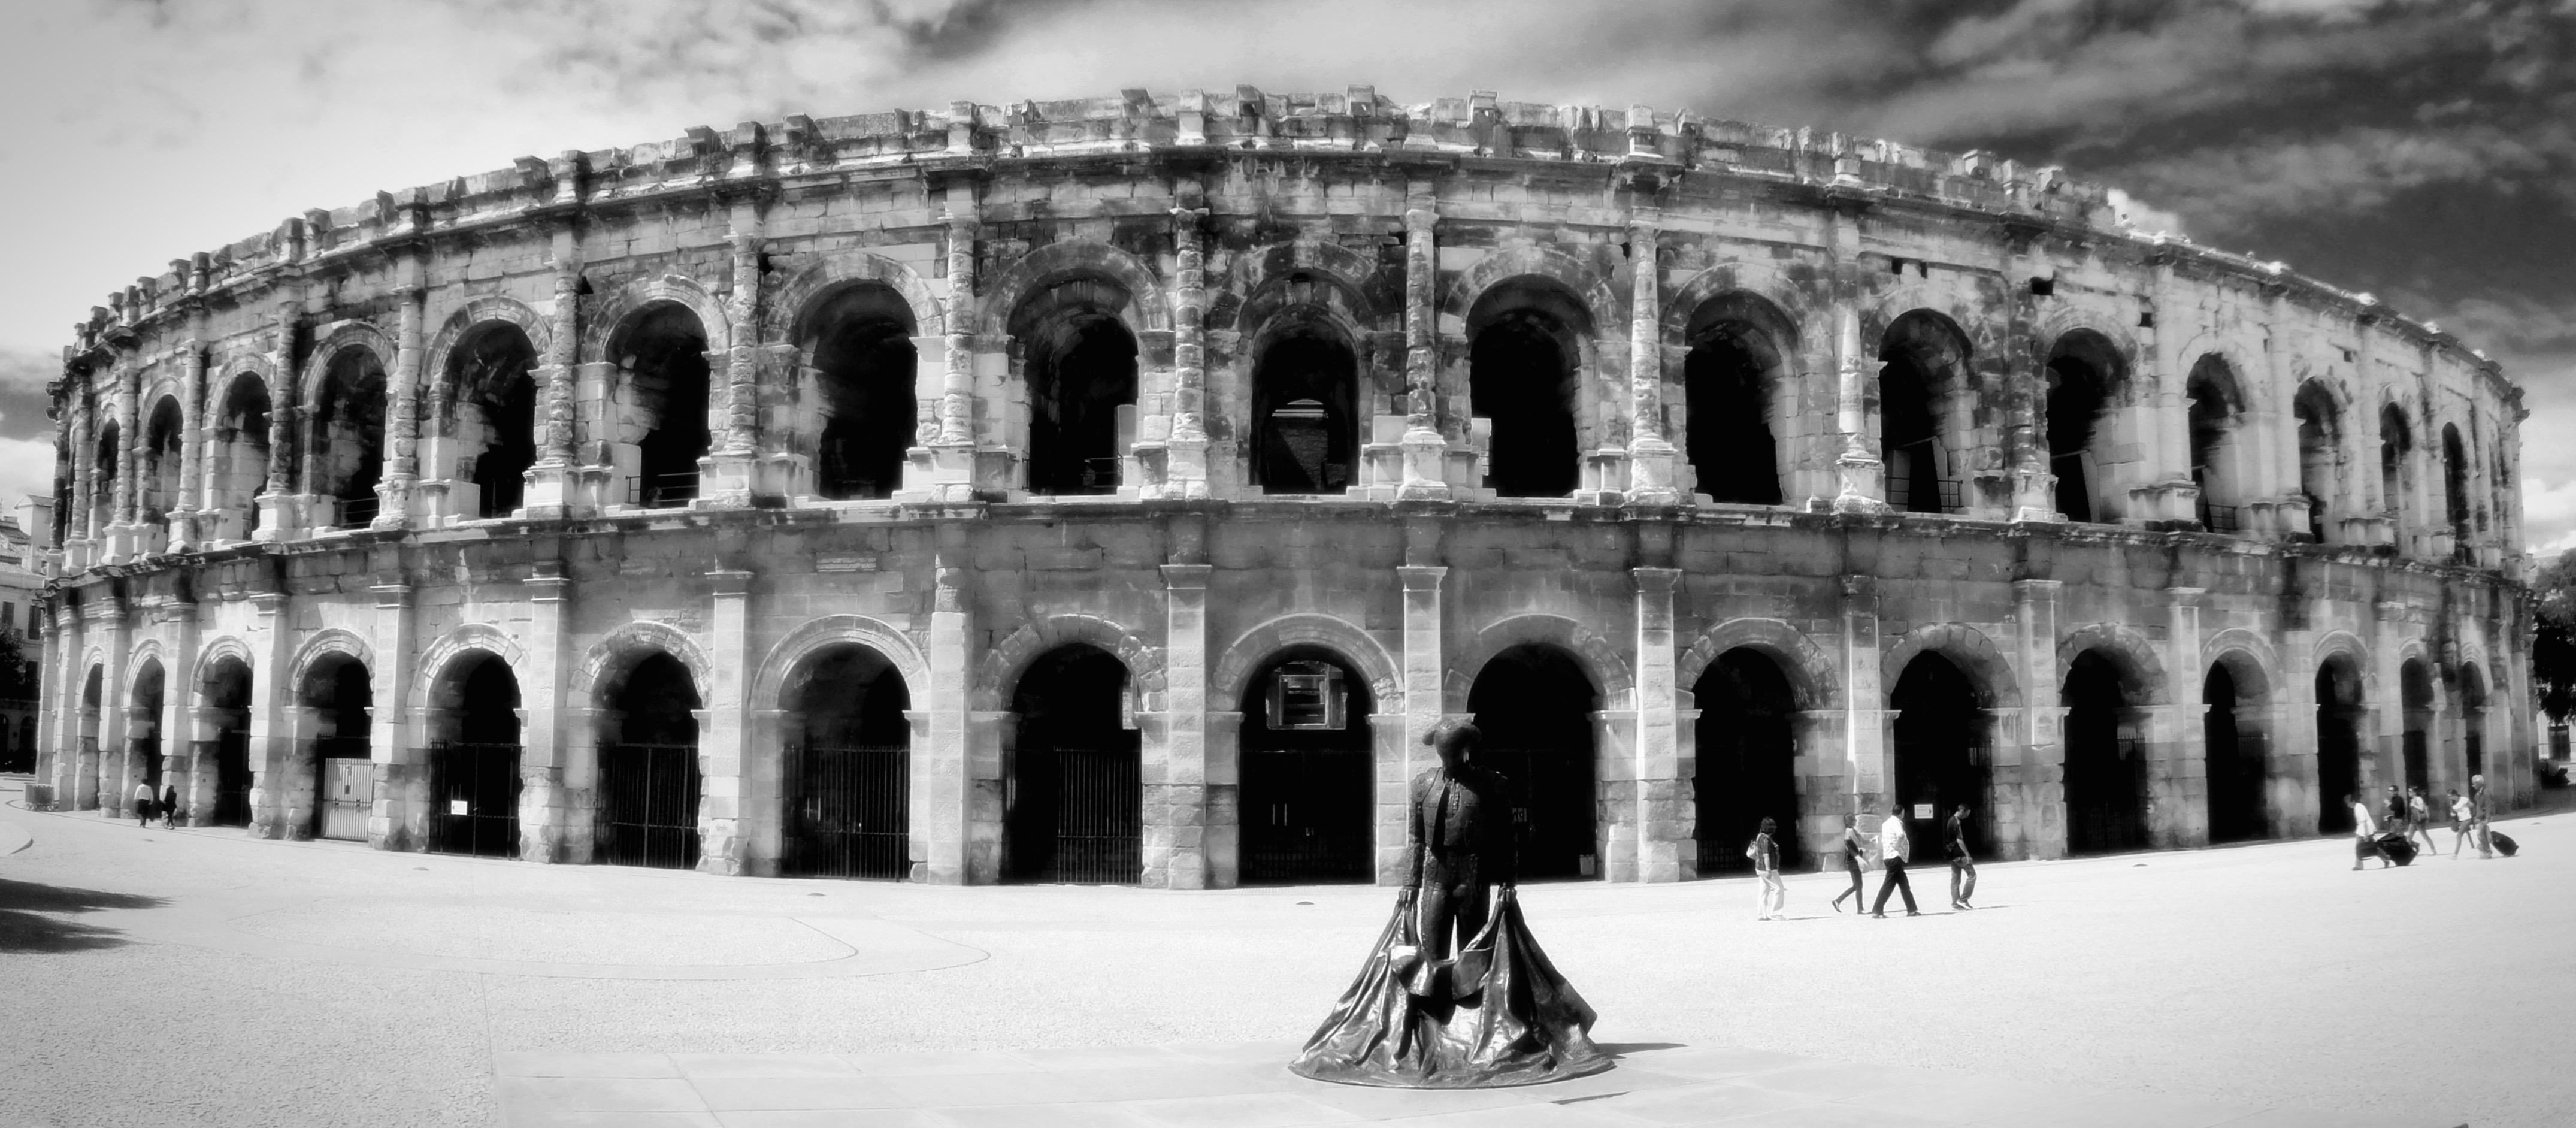 Рим черно-белая картинка диаграмма